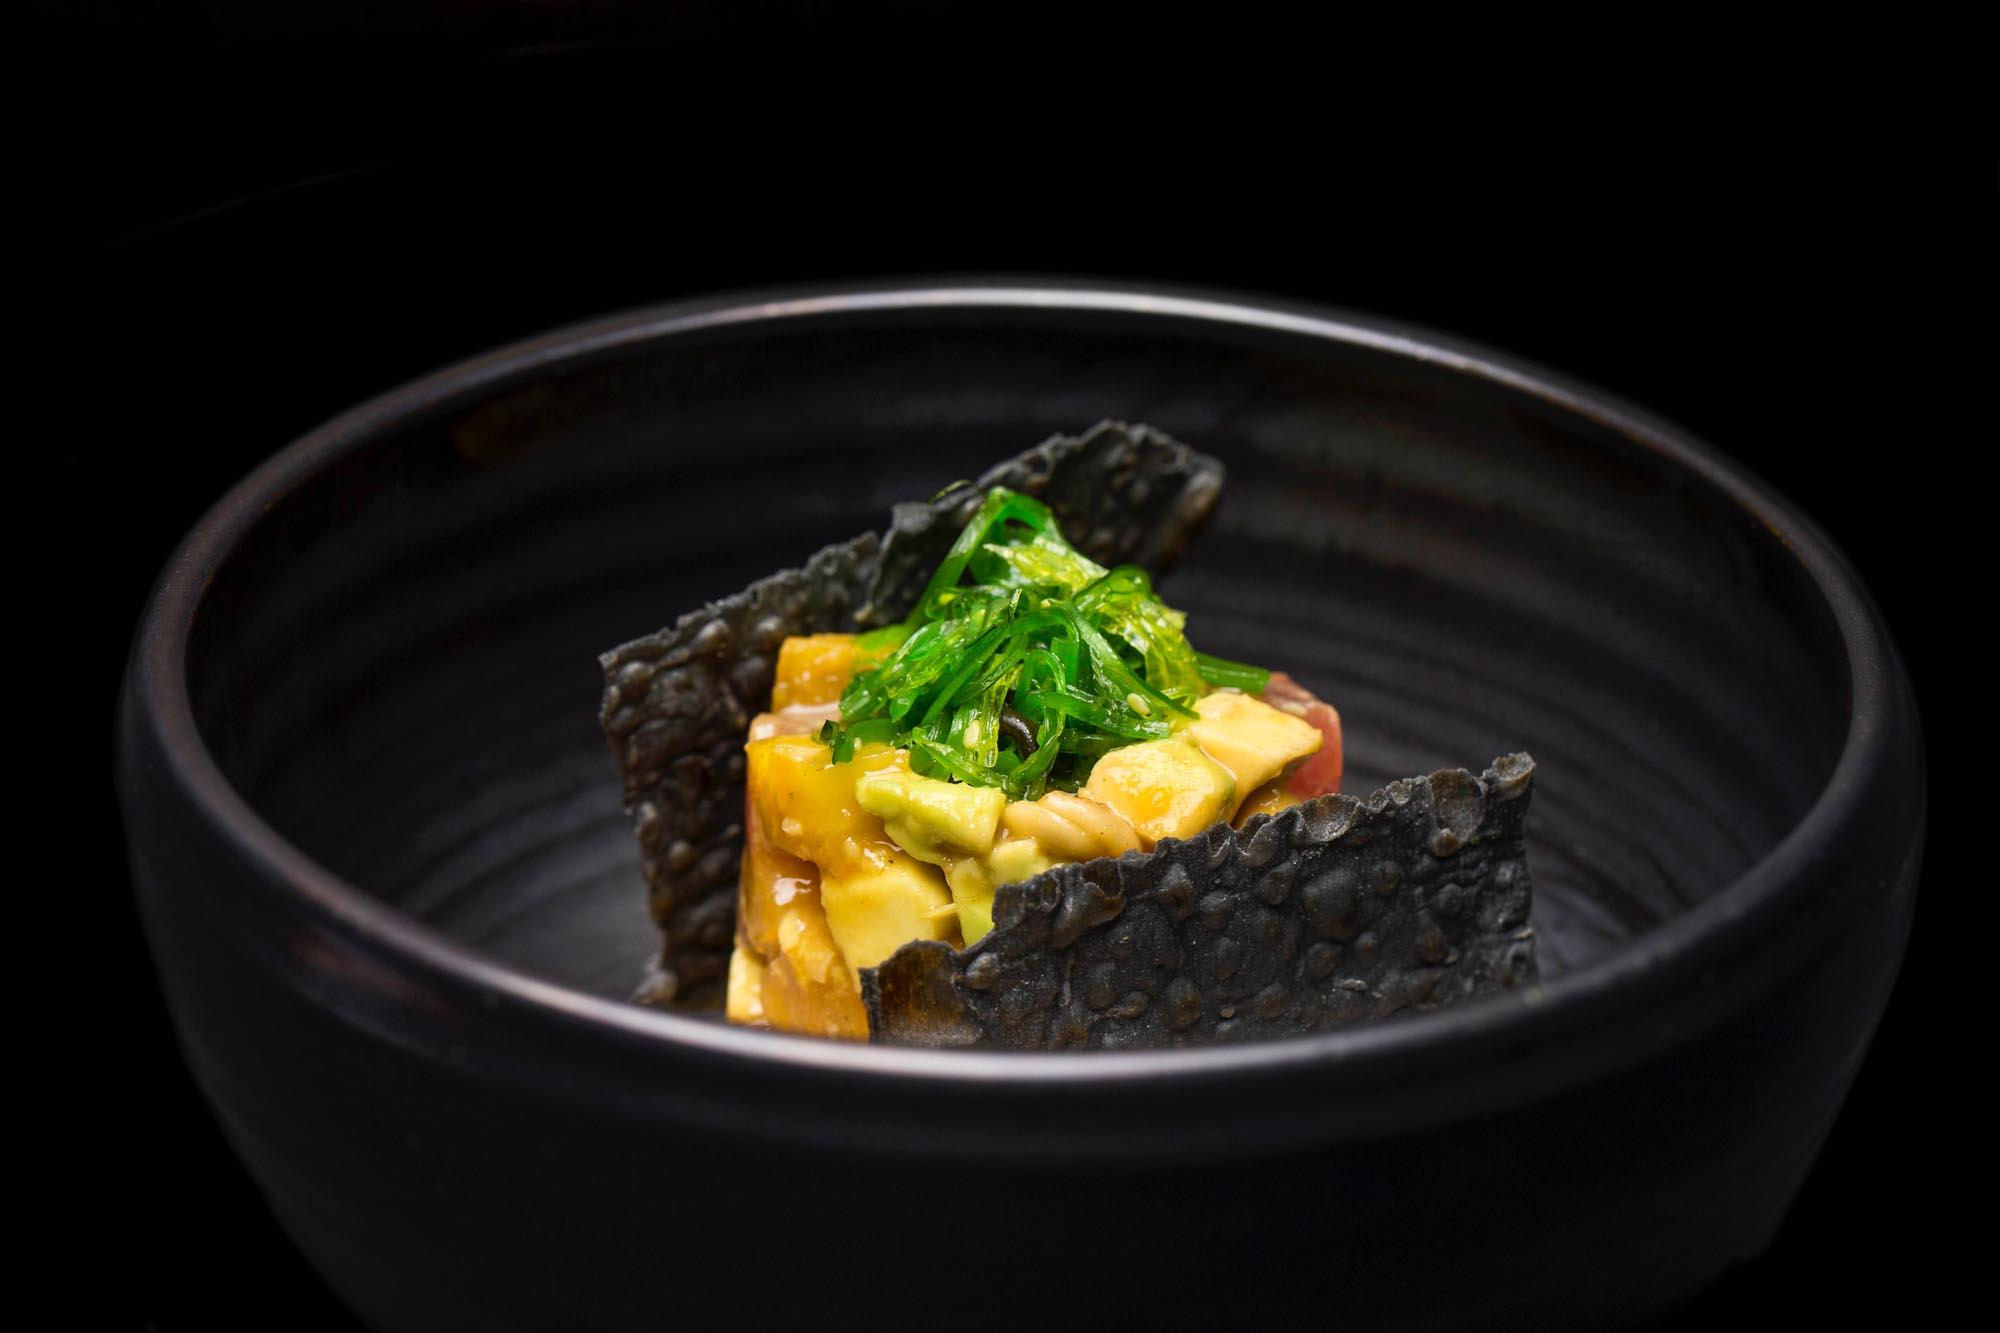 'Poke' de atún rojo con piña asada, anacardos y aguacate. Foto: 'Avec'.